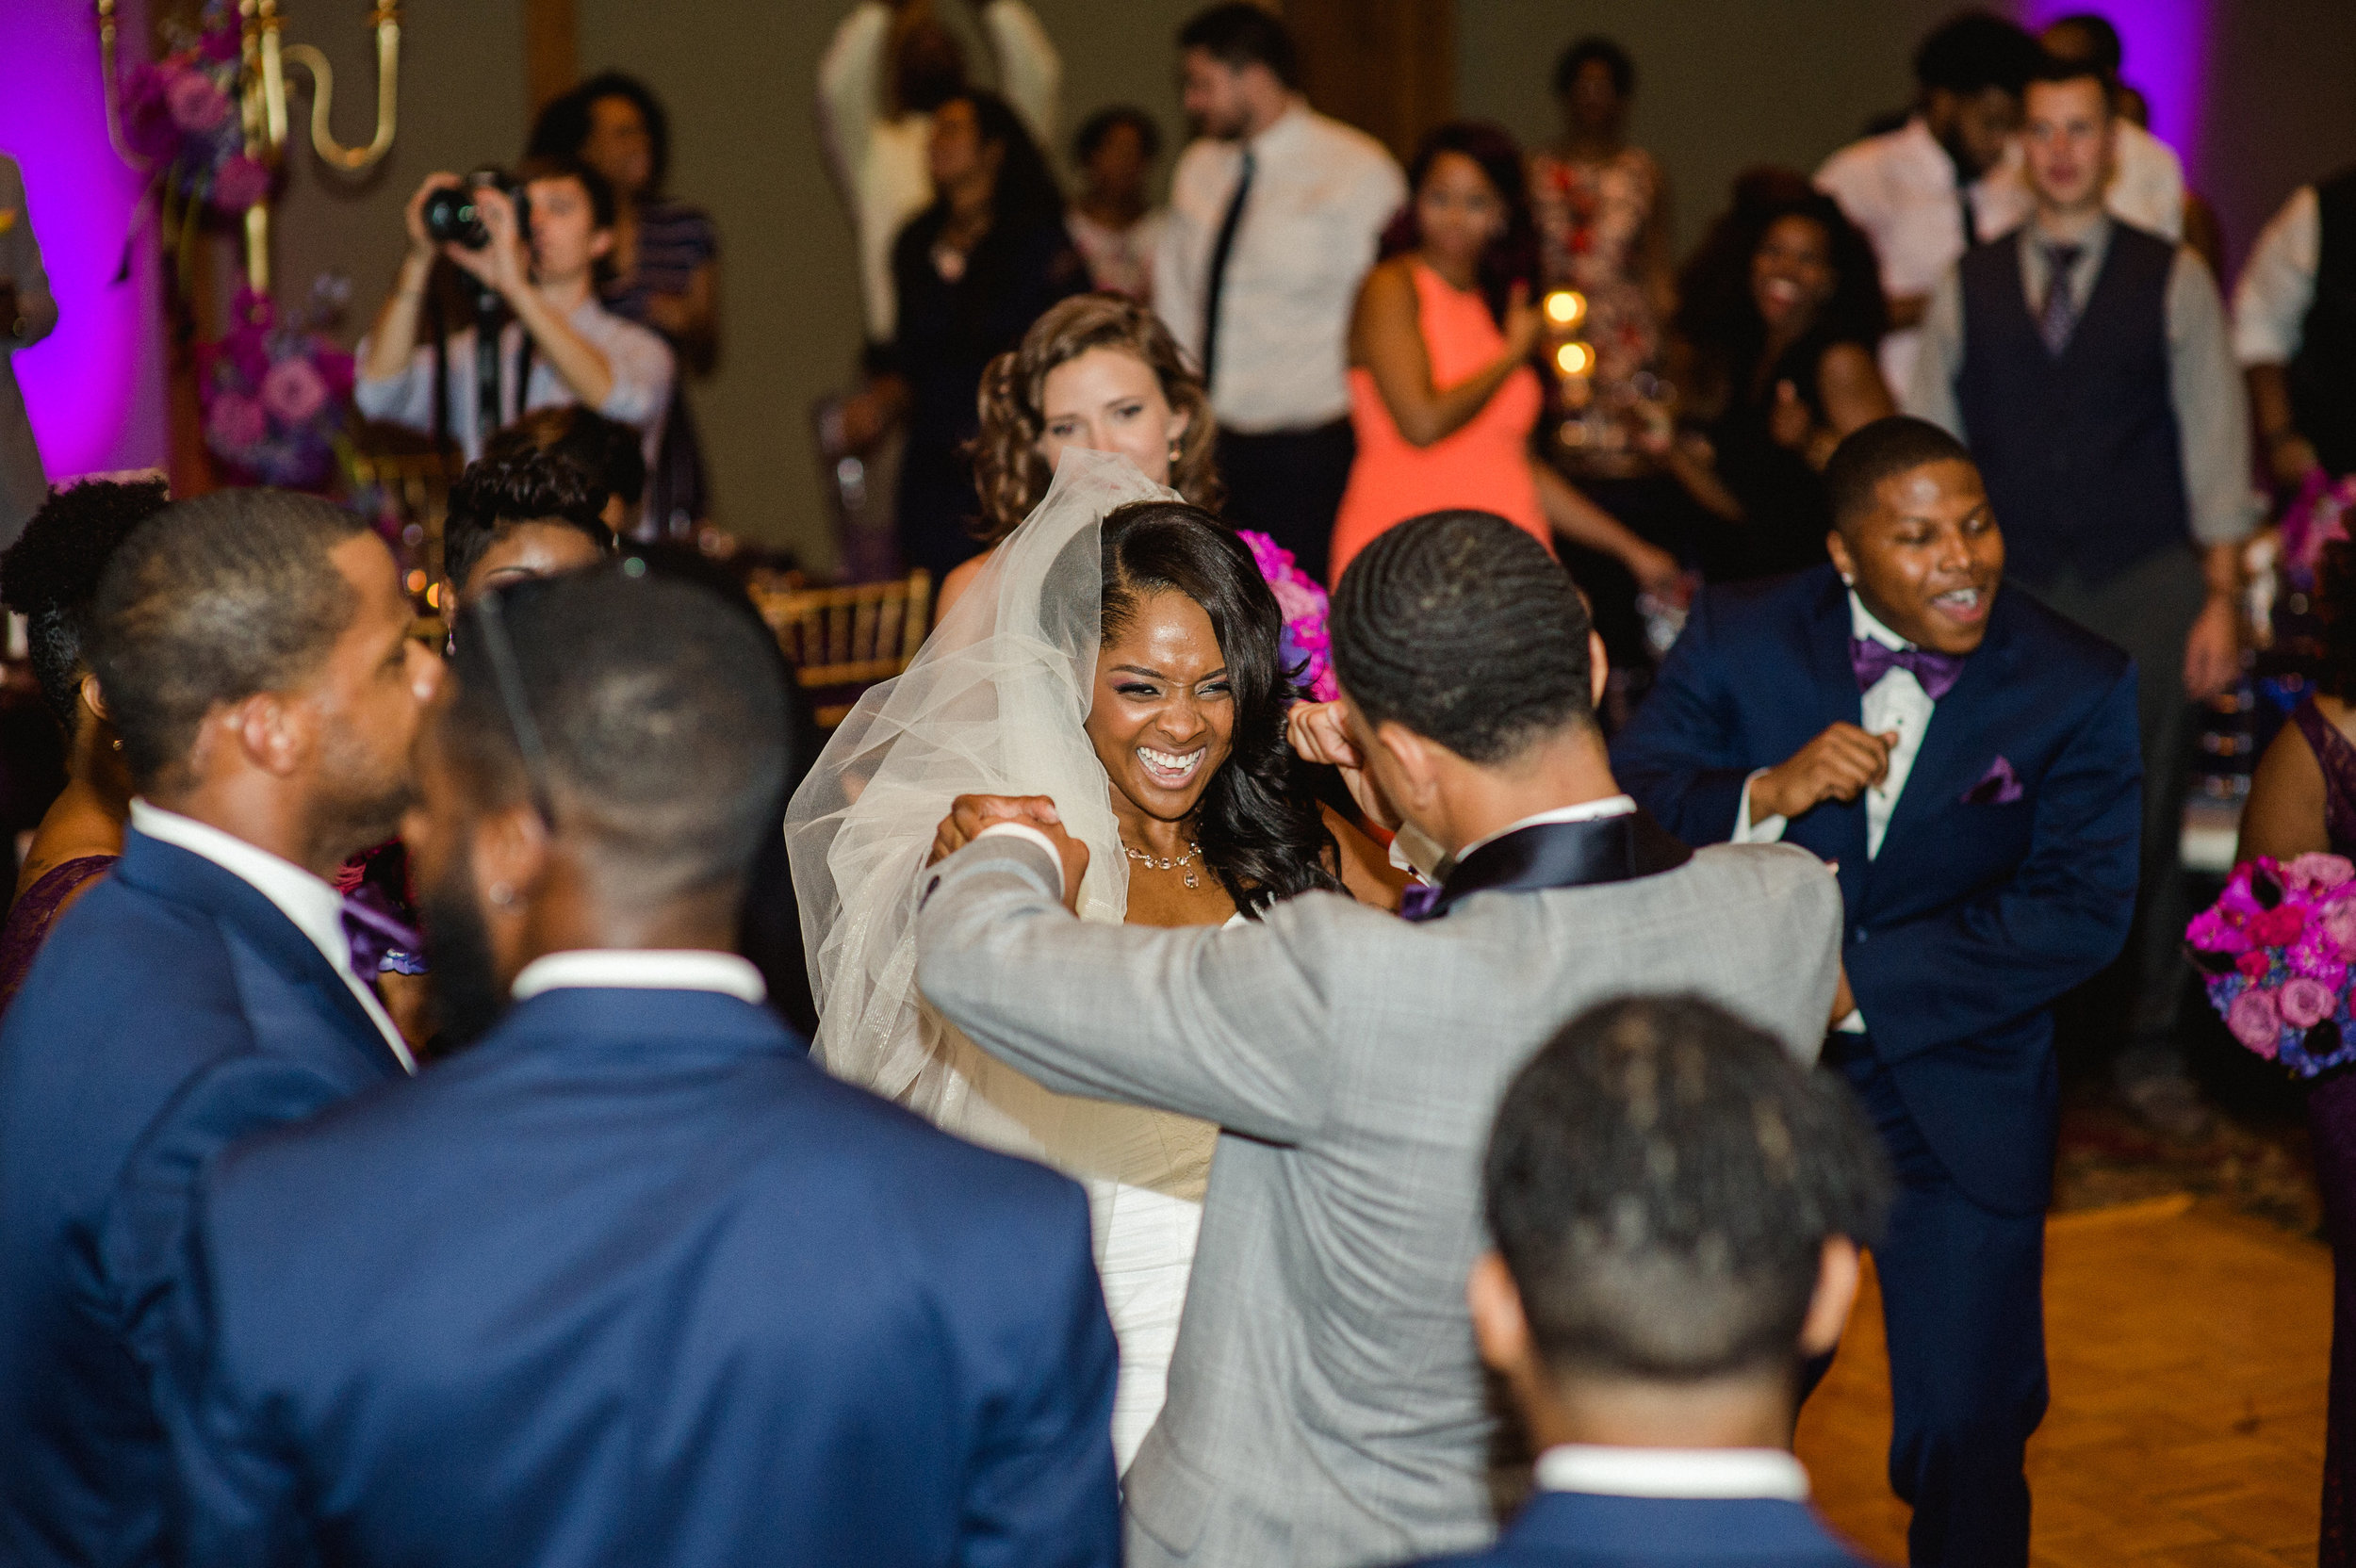 imani&chris|wedding|reception-93.jpg